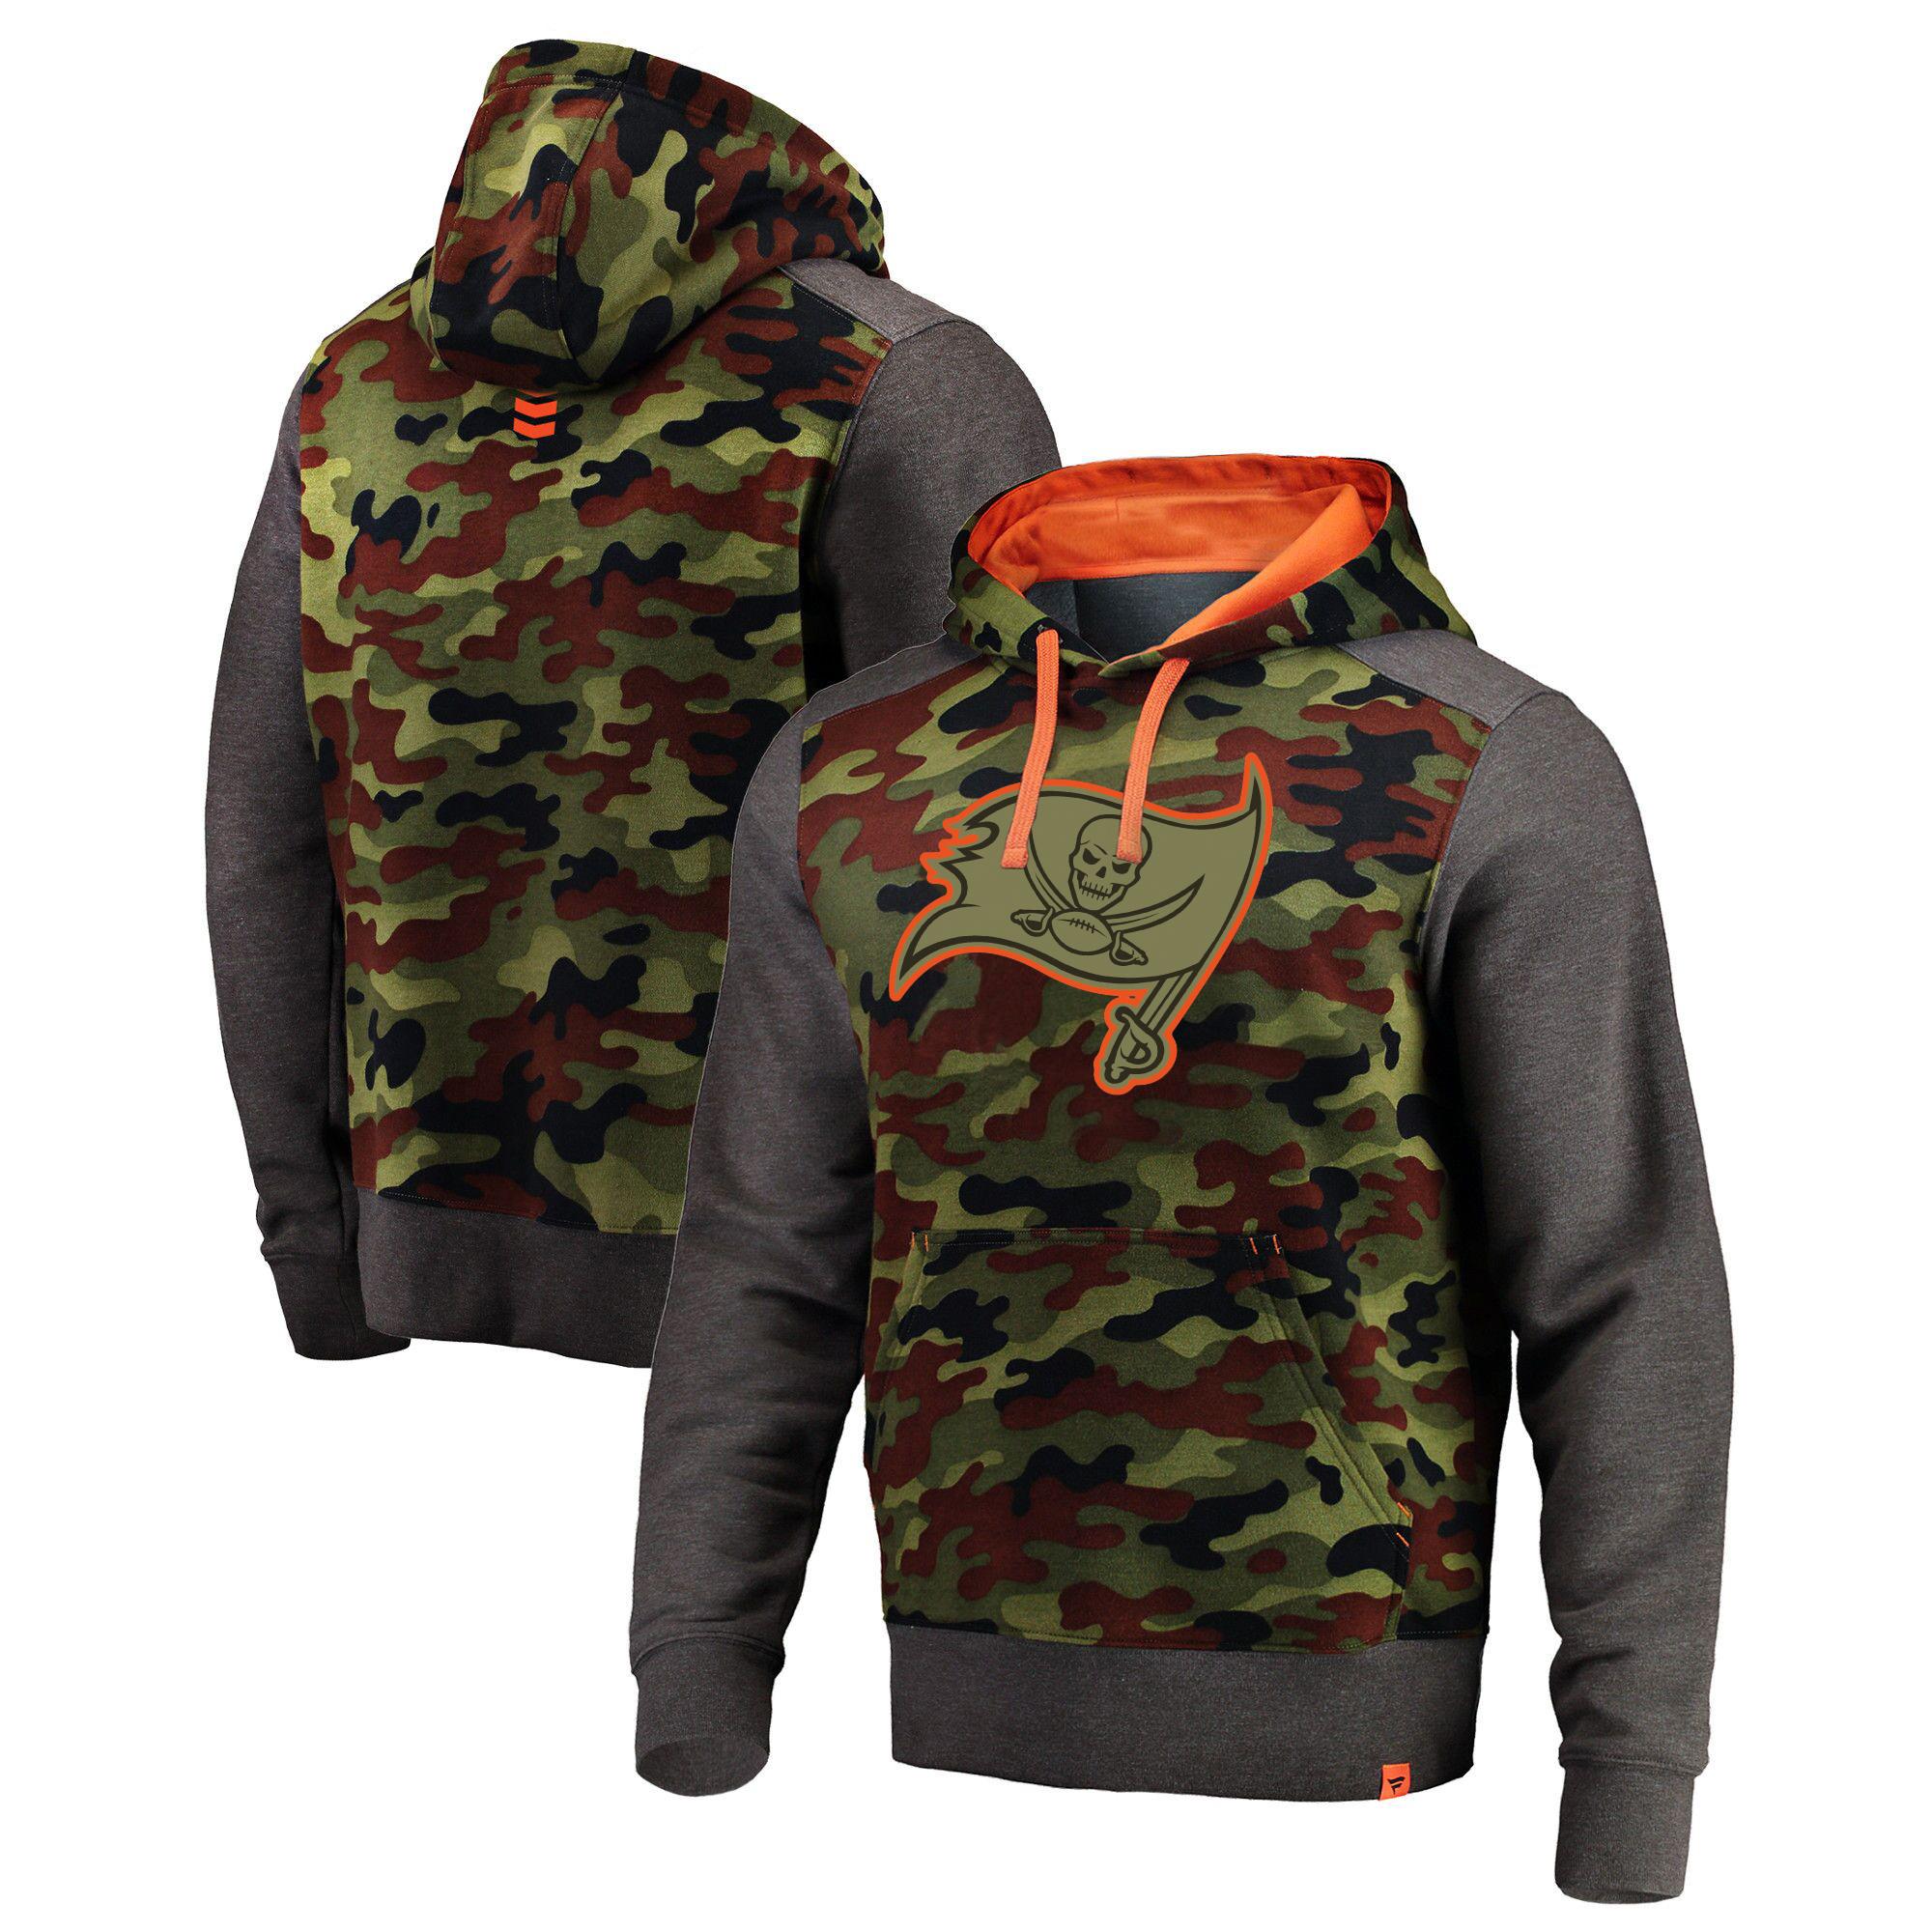 is cheap jerseys online legit Men\'s Tampa Bay Buccaneers Pro Line by Fanatics Branded Olive Recon Camo Pullover Hoodie nike soccer jerseys wholesale